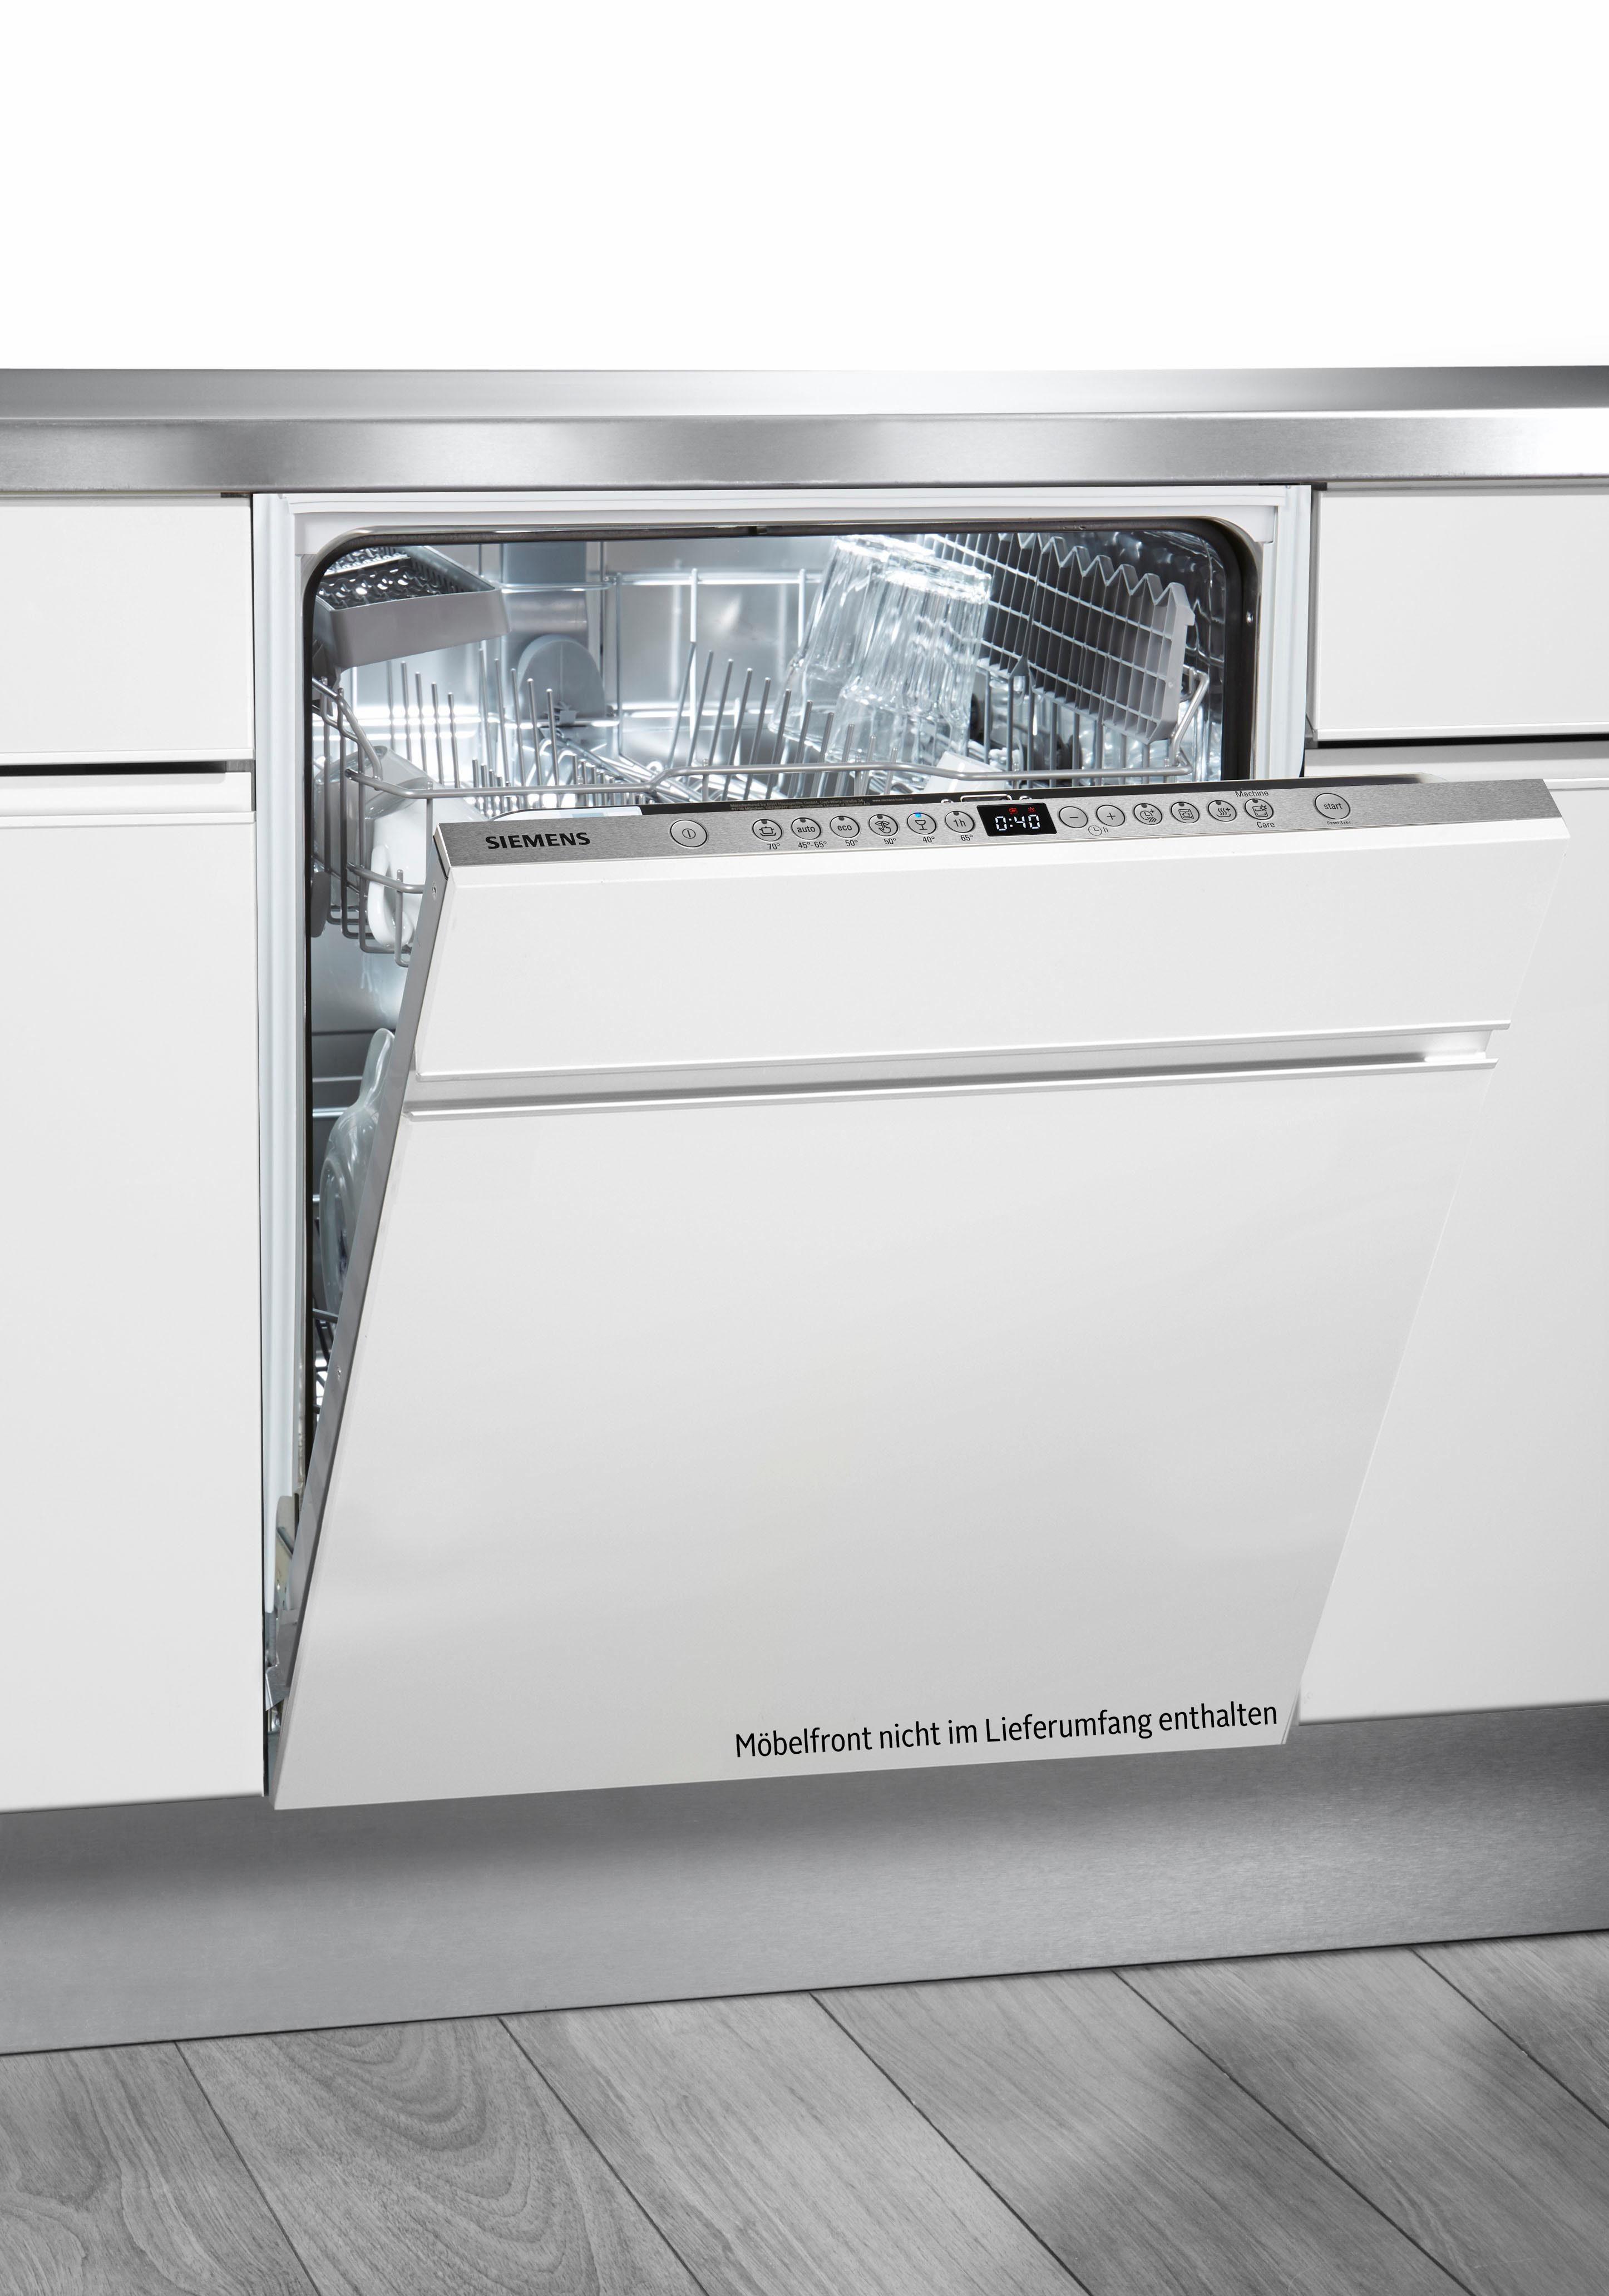 SIEMENS Vollintegrierbarer Einbaugeschirrspüler iQ300 SN636X01CE, A+++, 9,5 Liter, 13 Maßgedecke